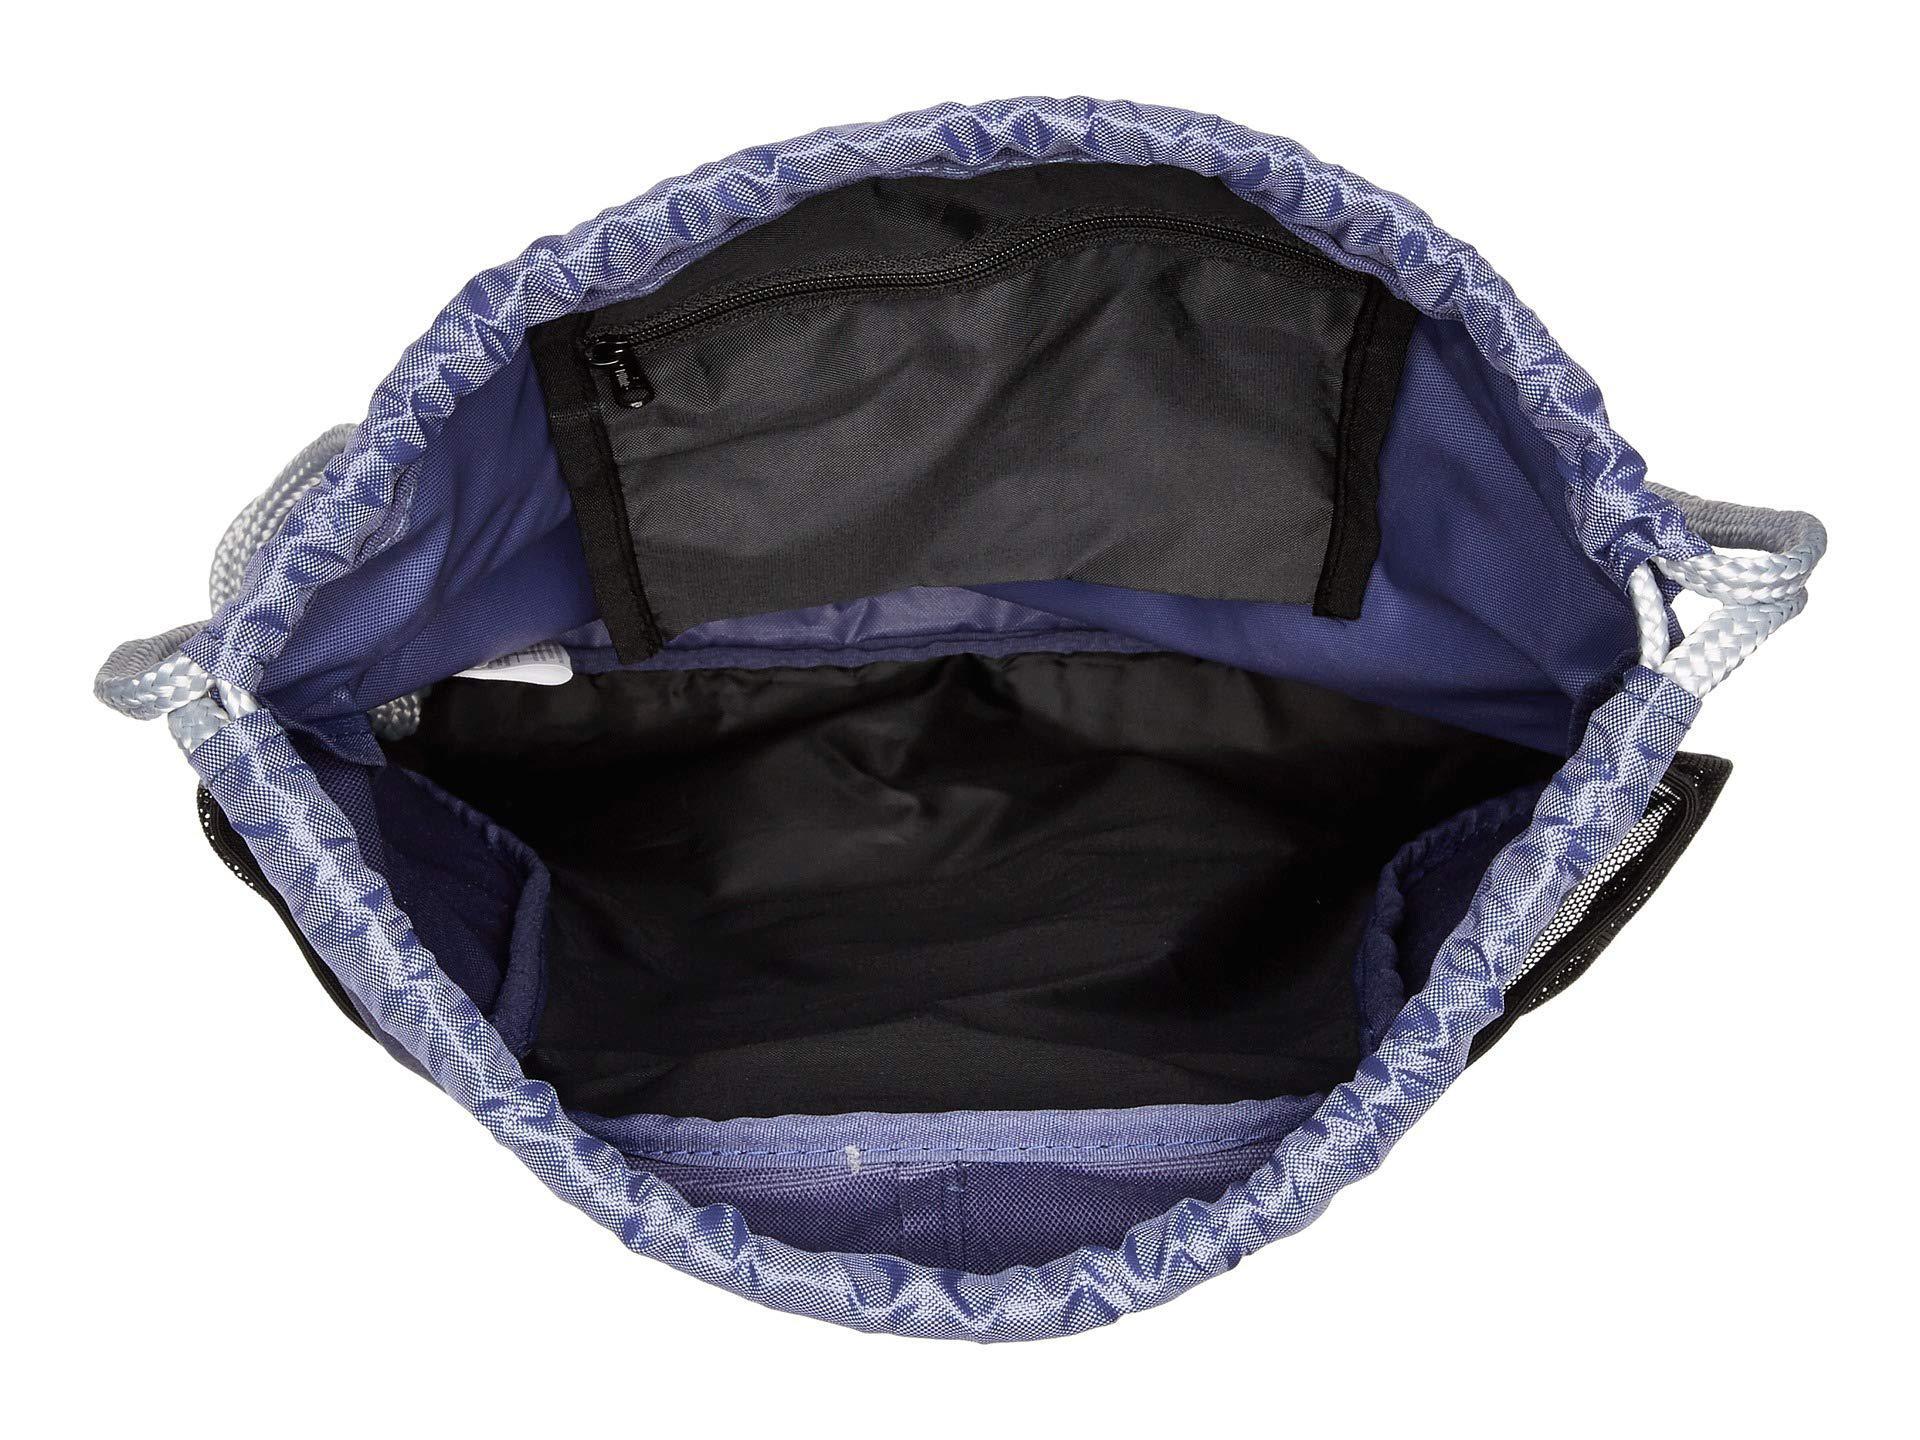 ead78d7e3f586 Lyst - PUMA Evercat Equinox Carrysack in Blue for Men